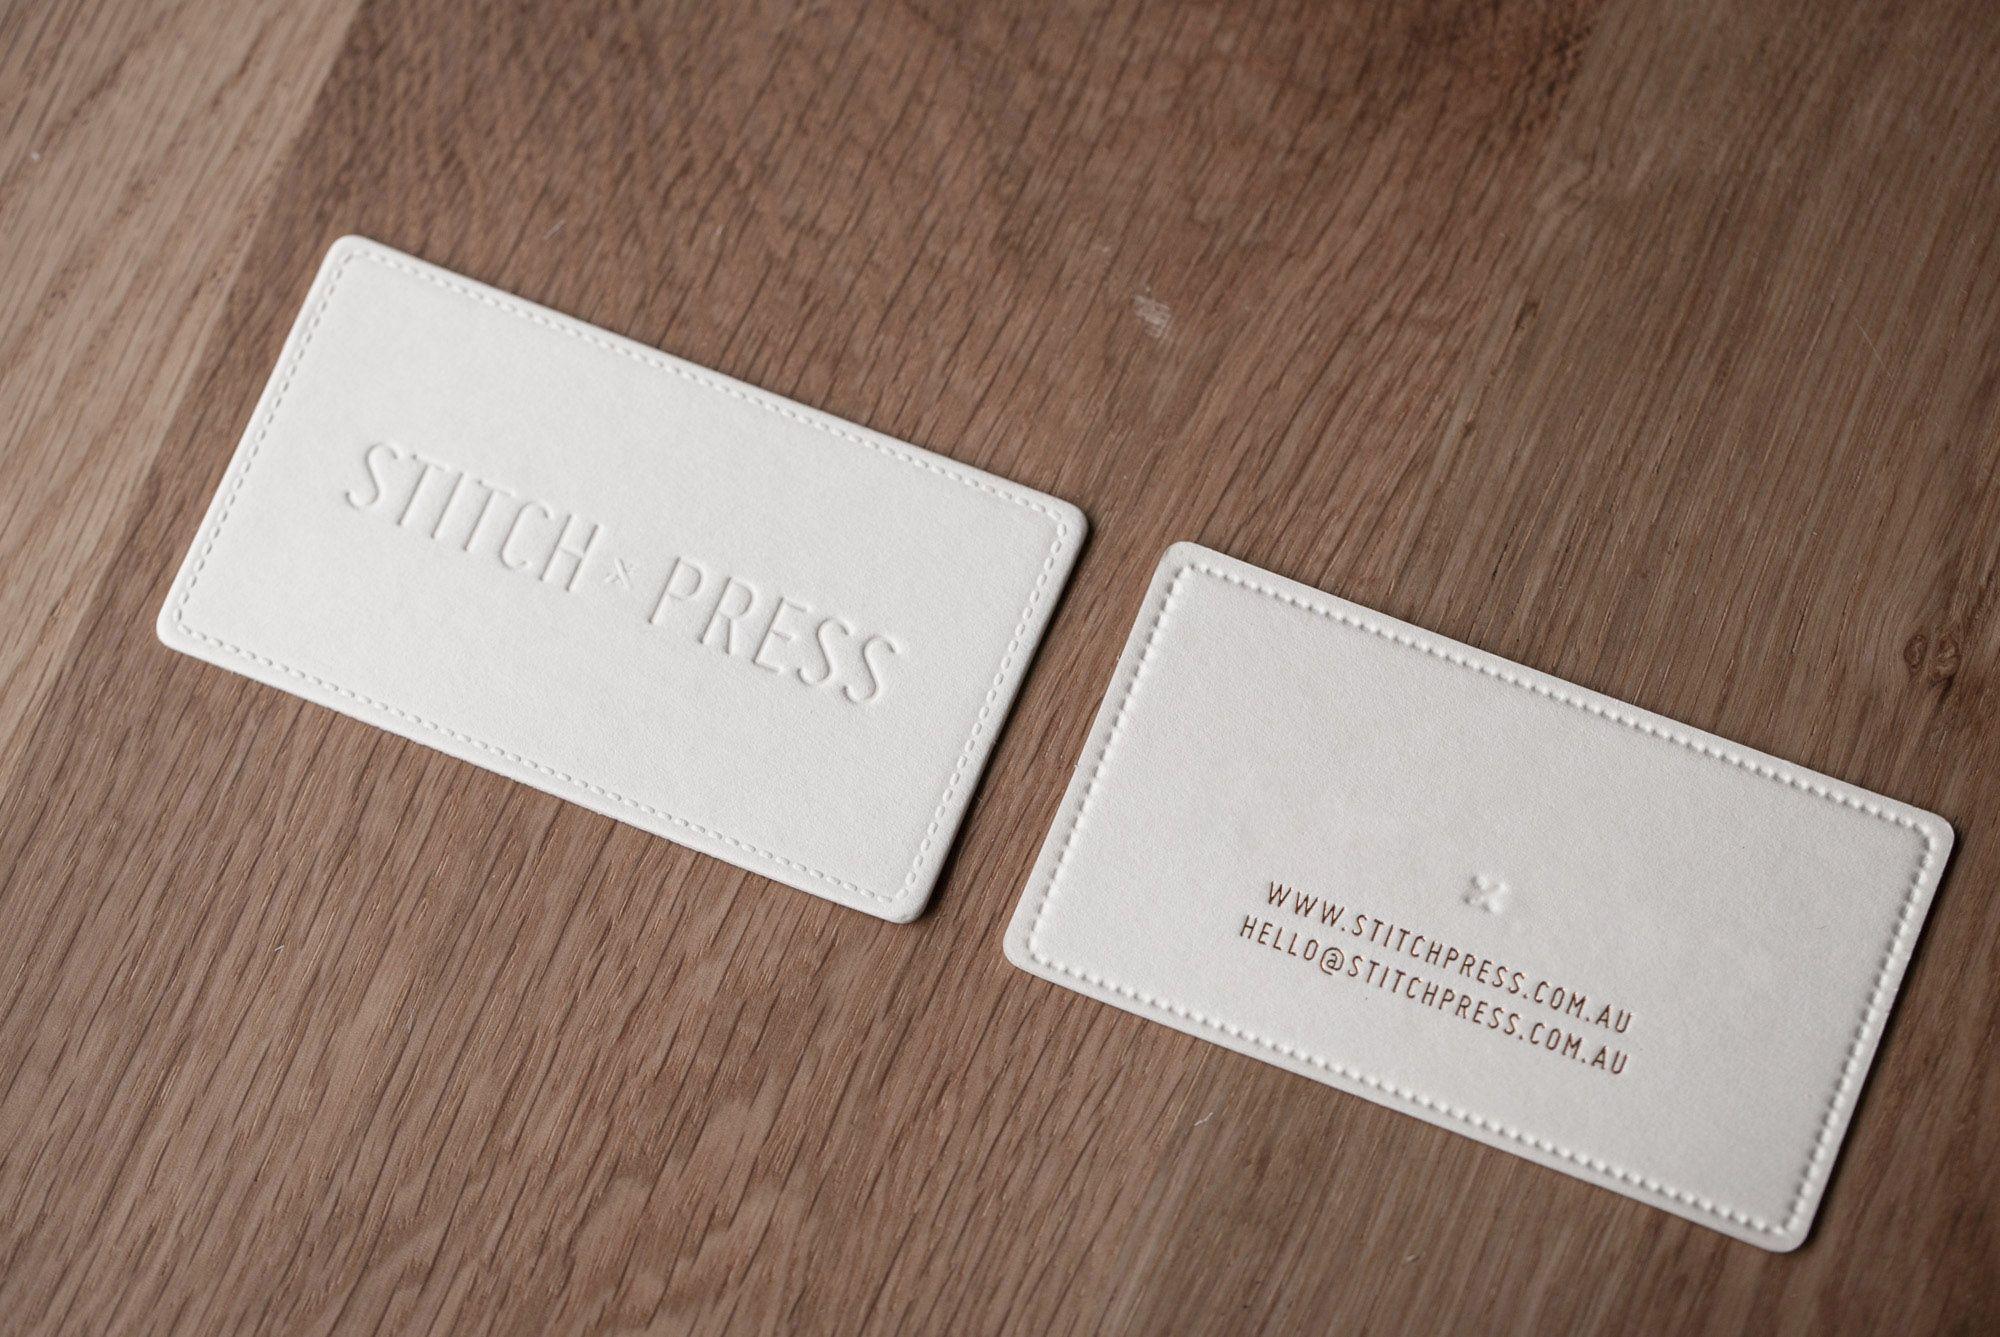 Foiling business card stitch press business card blind deboss foiling business card stitch press business card blind deboss emboss business card colourmoves Images